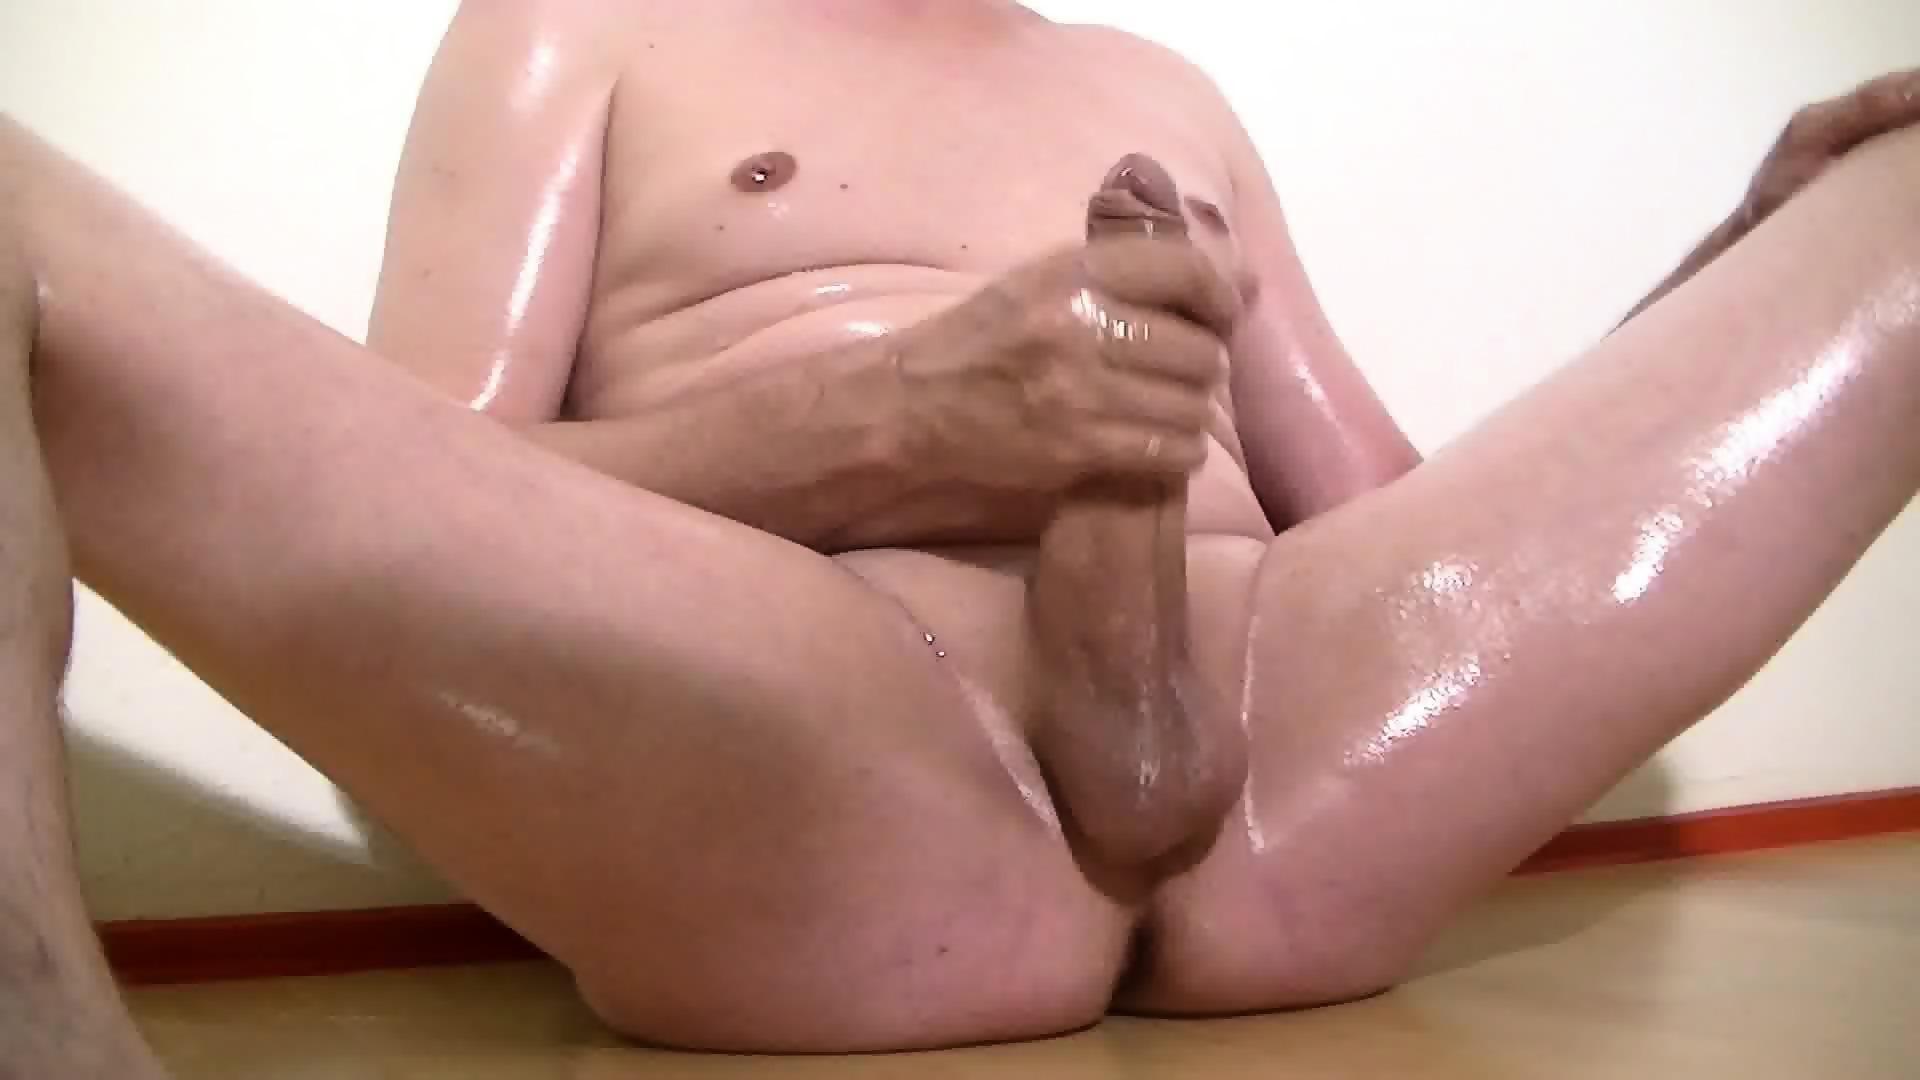 Masurbation